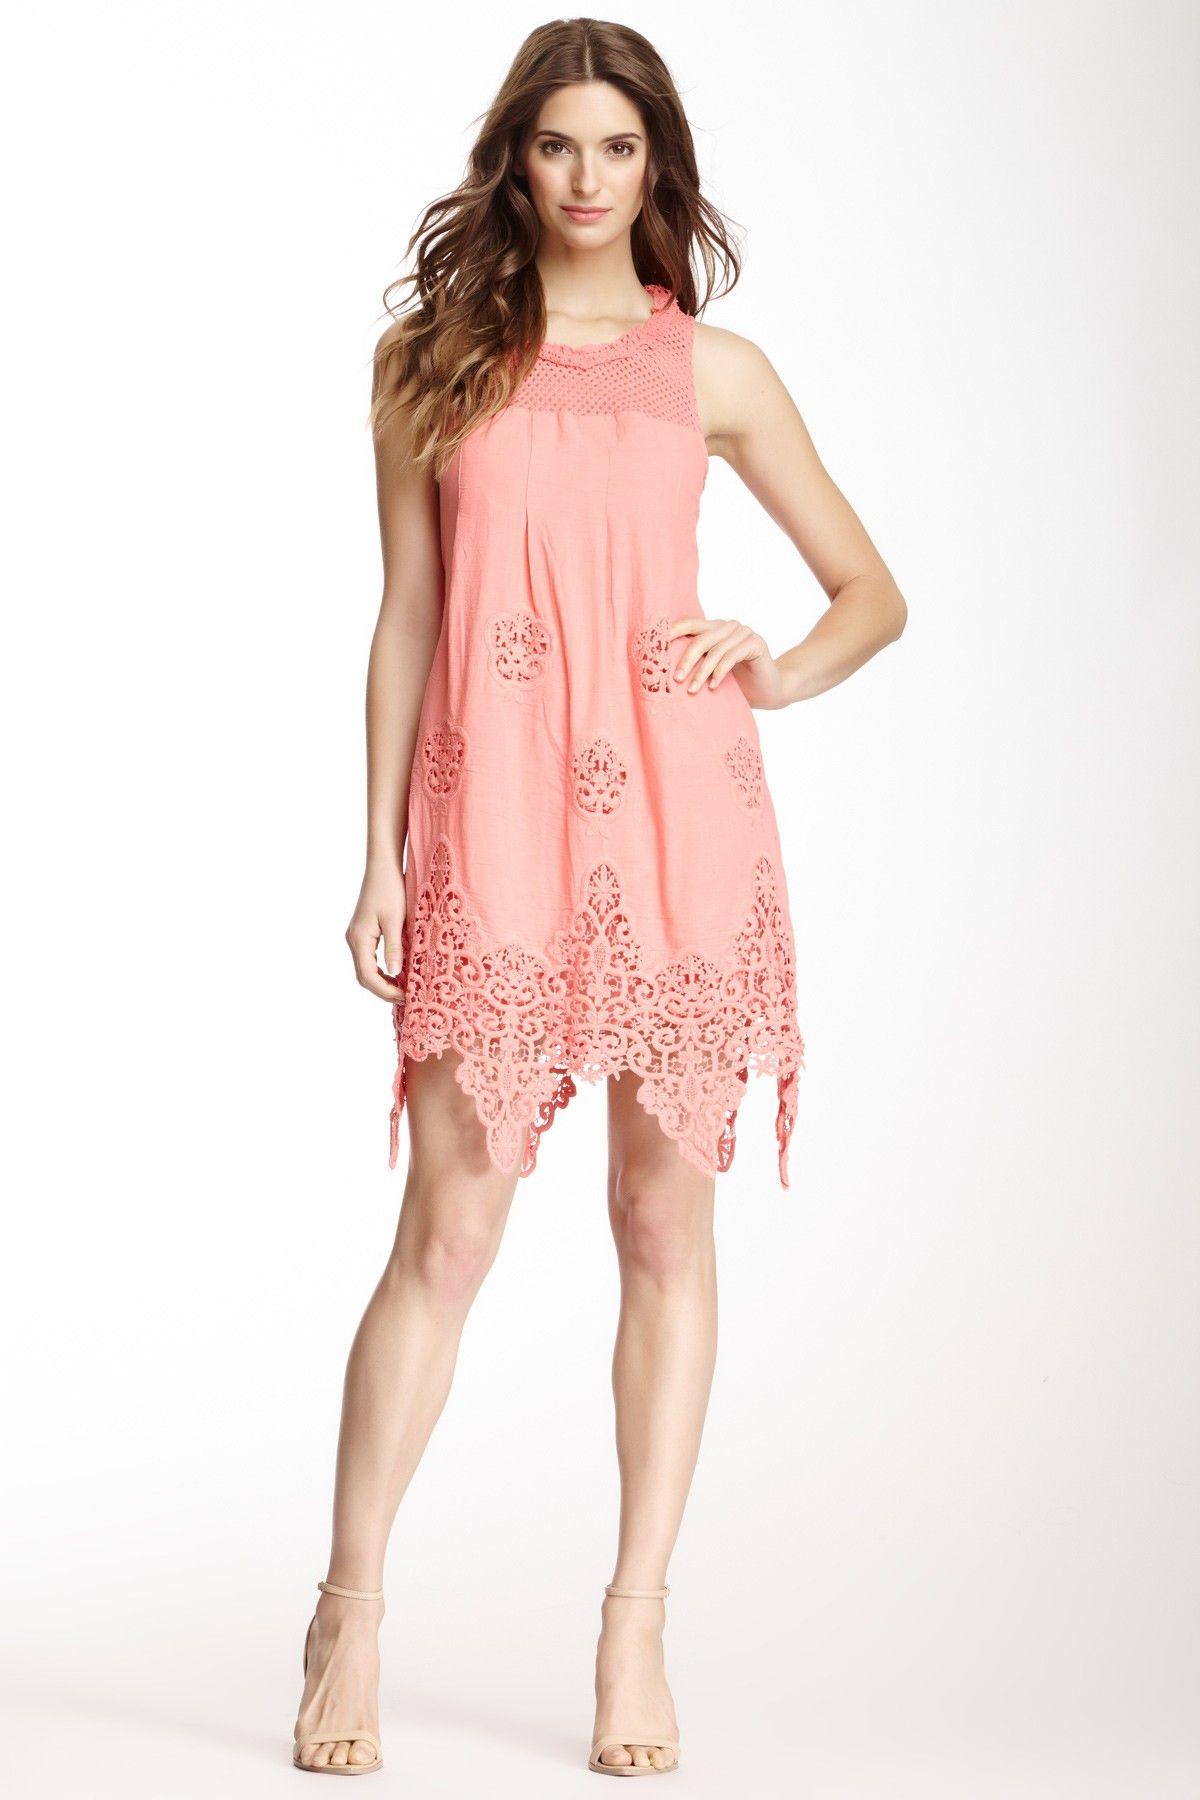 Crochet Dress | Outfit | Pinterest | Vestido de lujo, Ropa cómoda y ...